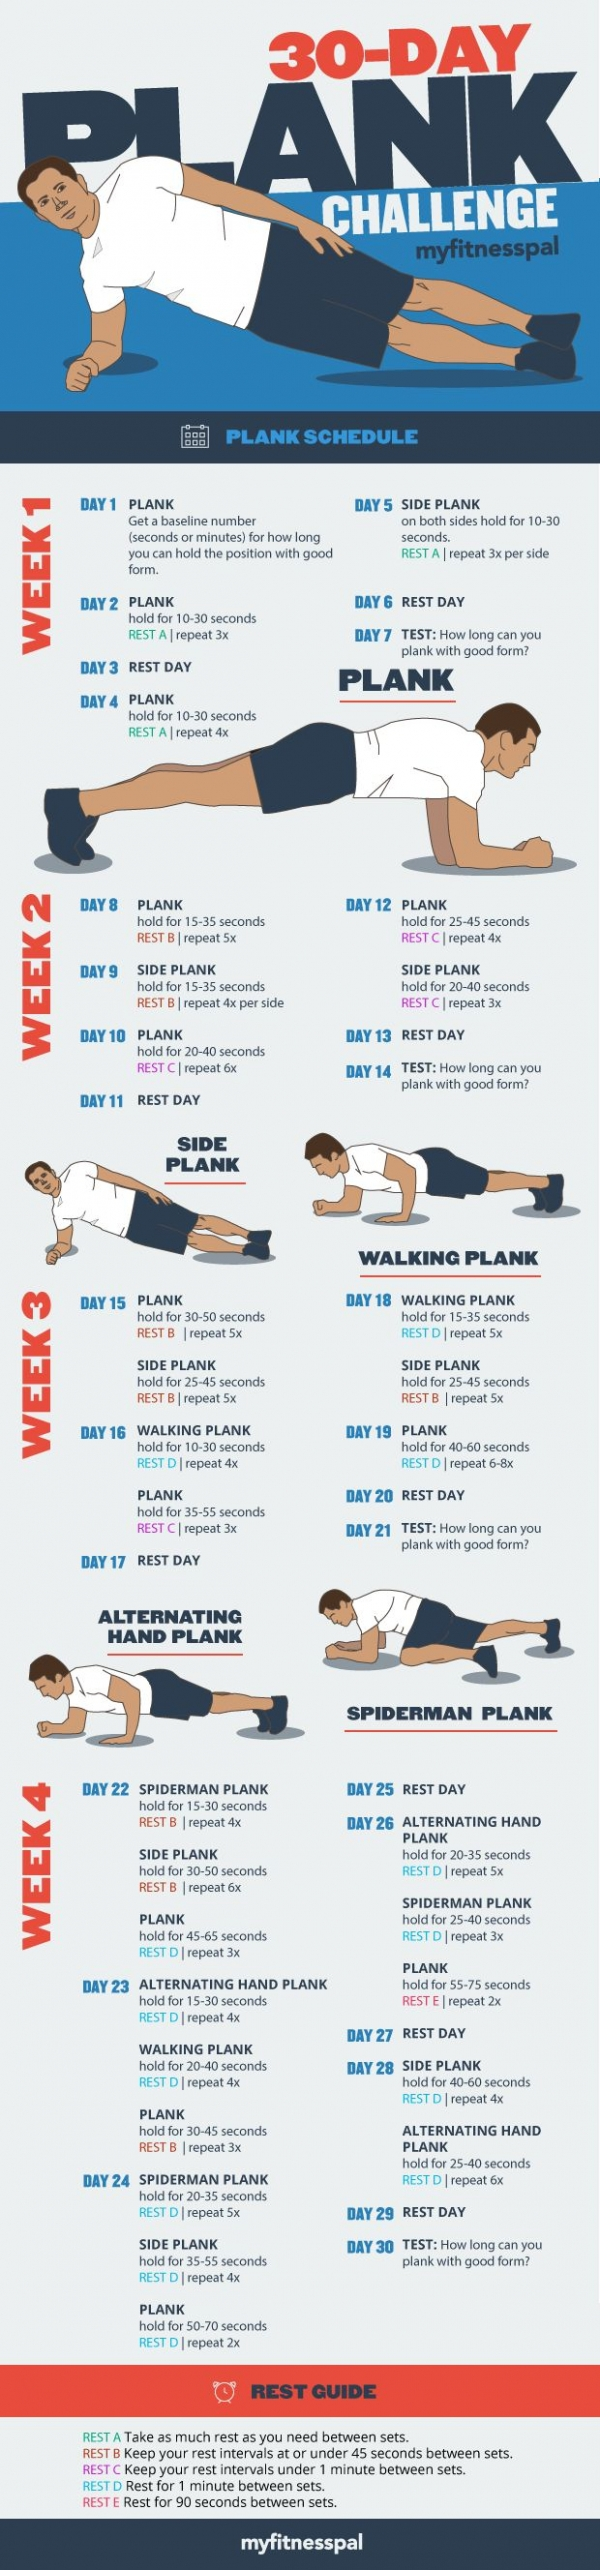 30-Day Plank Challenge